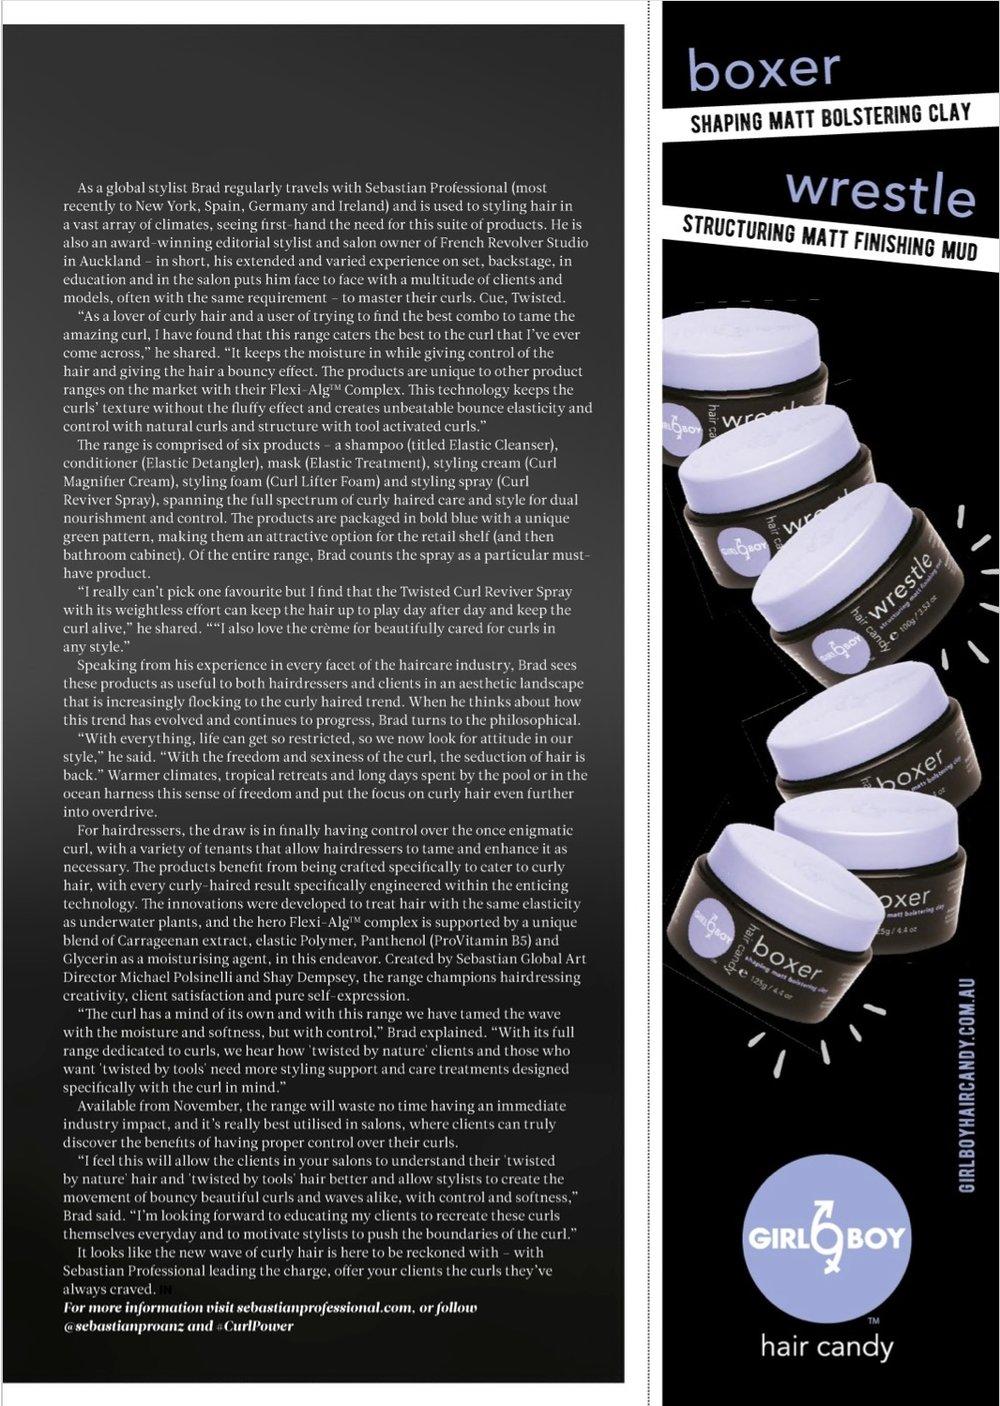 INSTYLE Magazine, INSTYLE NOV-DEC 2017 page 2.jpg